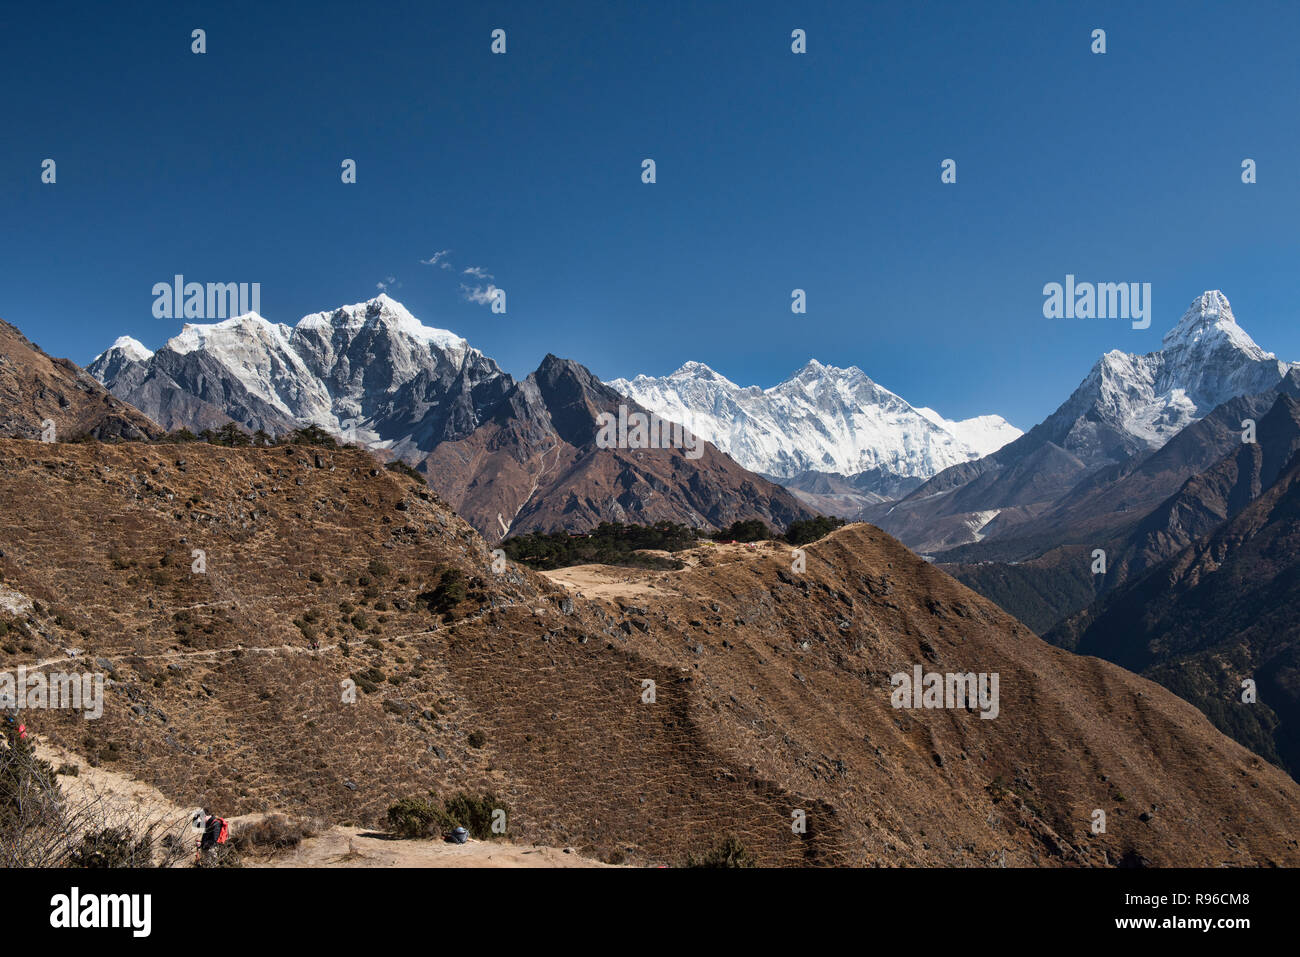 Ama Dablam and Everest rise above the Khumbu Valley, Everest region, Nepal - Stock Image